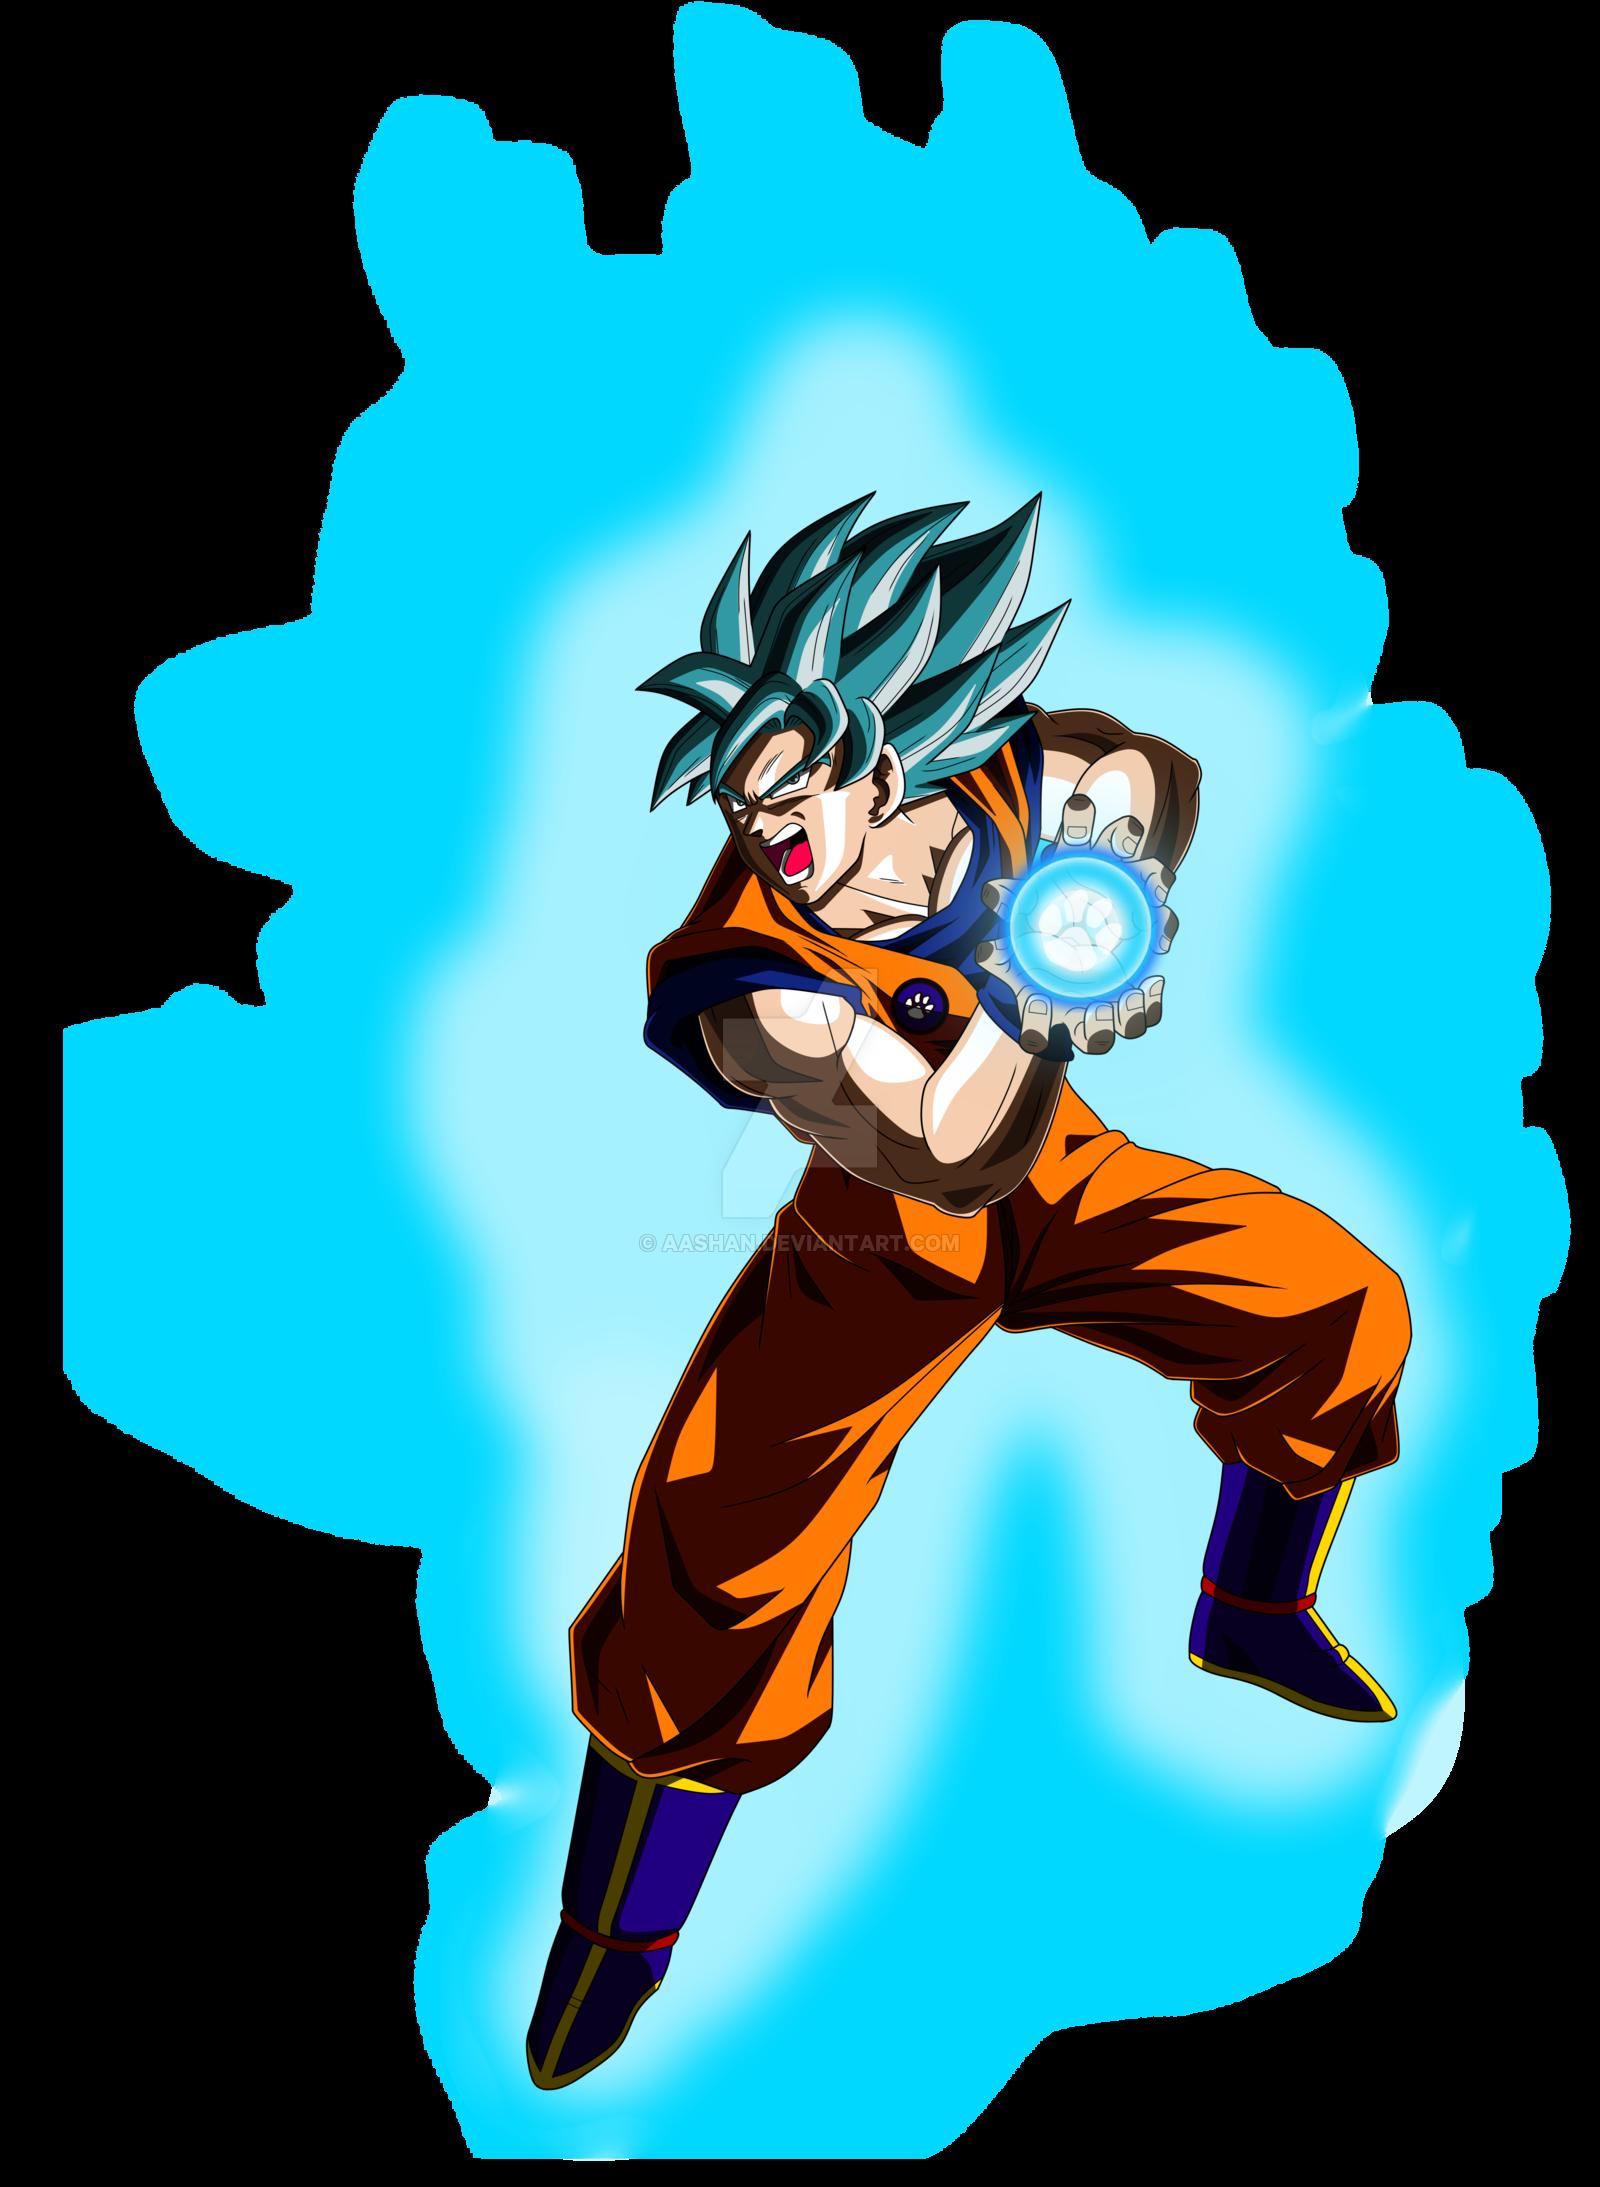 1600x2187 Goku Super Saiyan Blue Kamehameha Pose By Aashananimeart